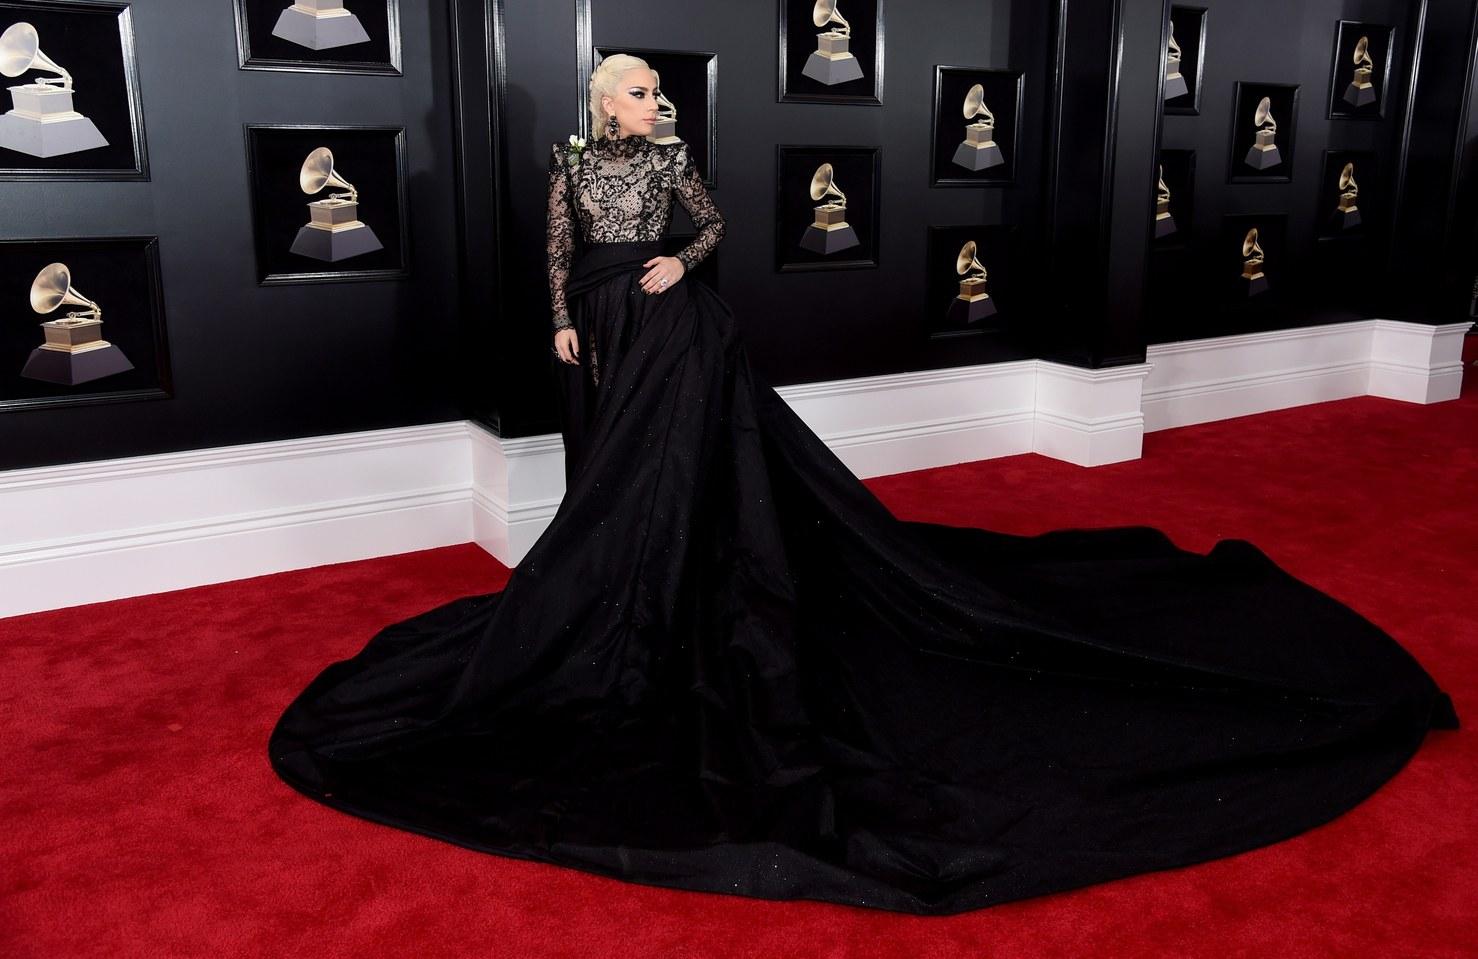 2018 Grammys: Grammys 2018, Our Favorite Red Carpet Looks